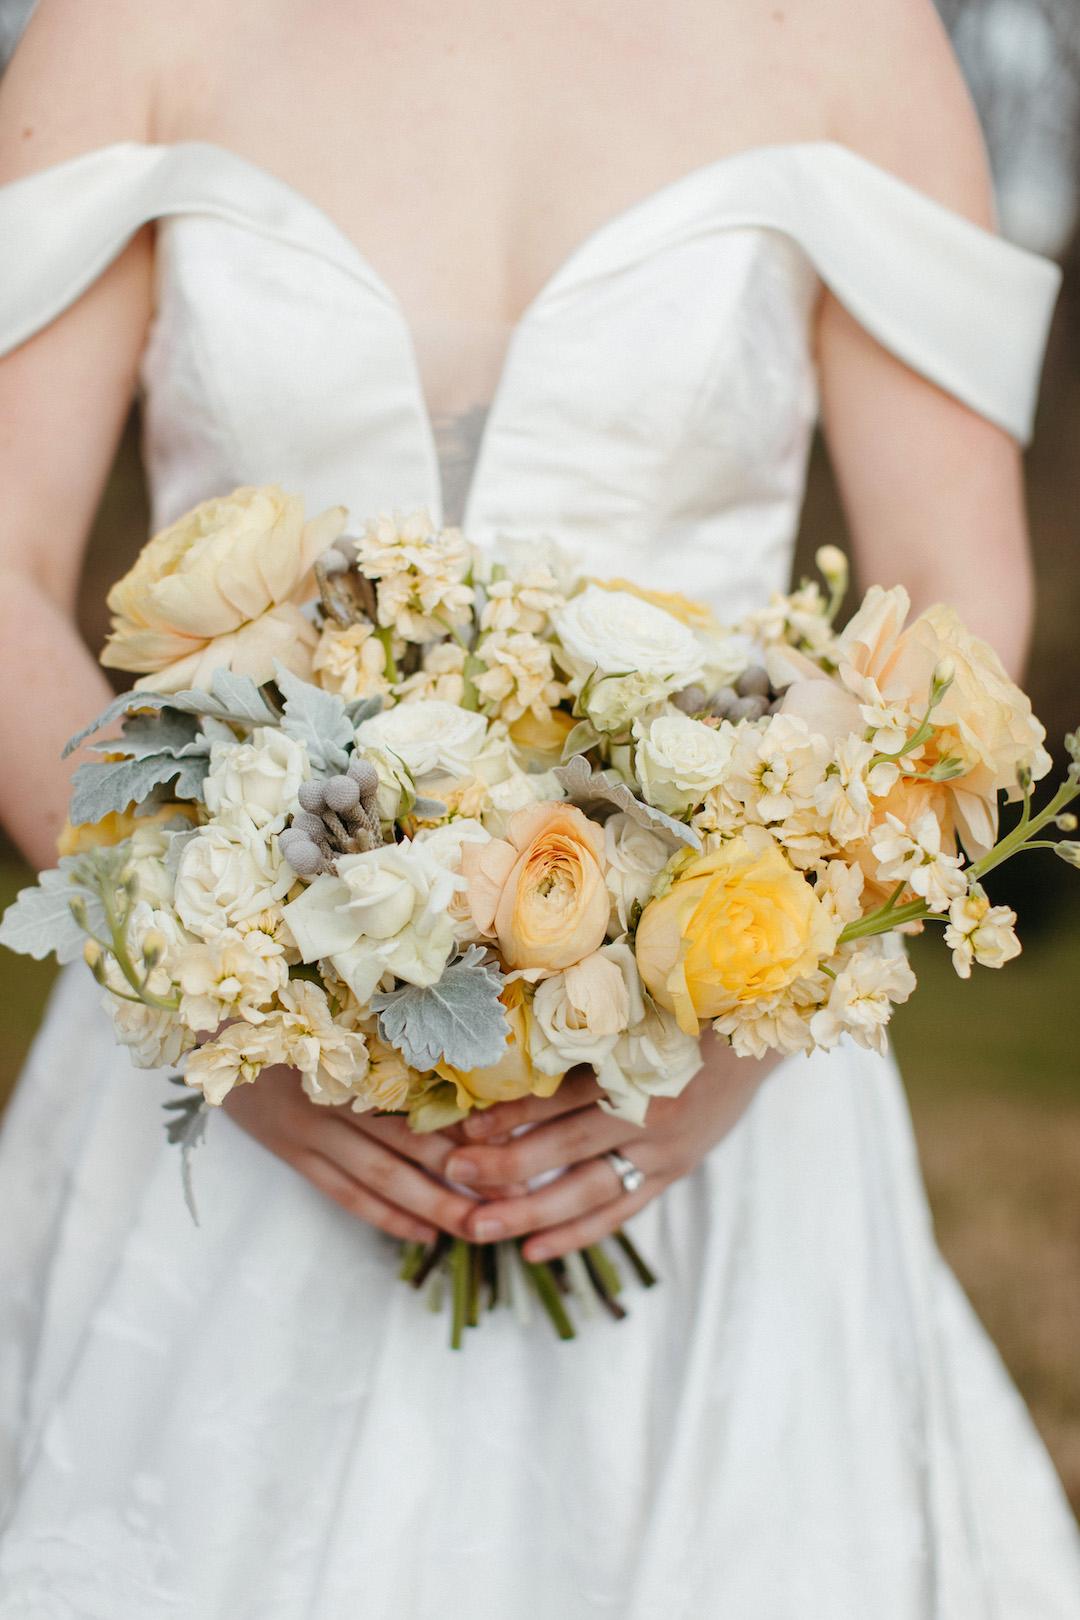 Cedarwood weddings Nashville wedding flowers | Nashville Bride Guide